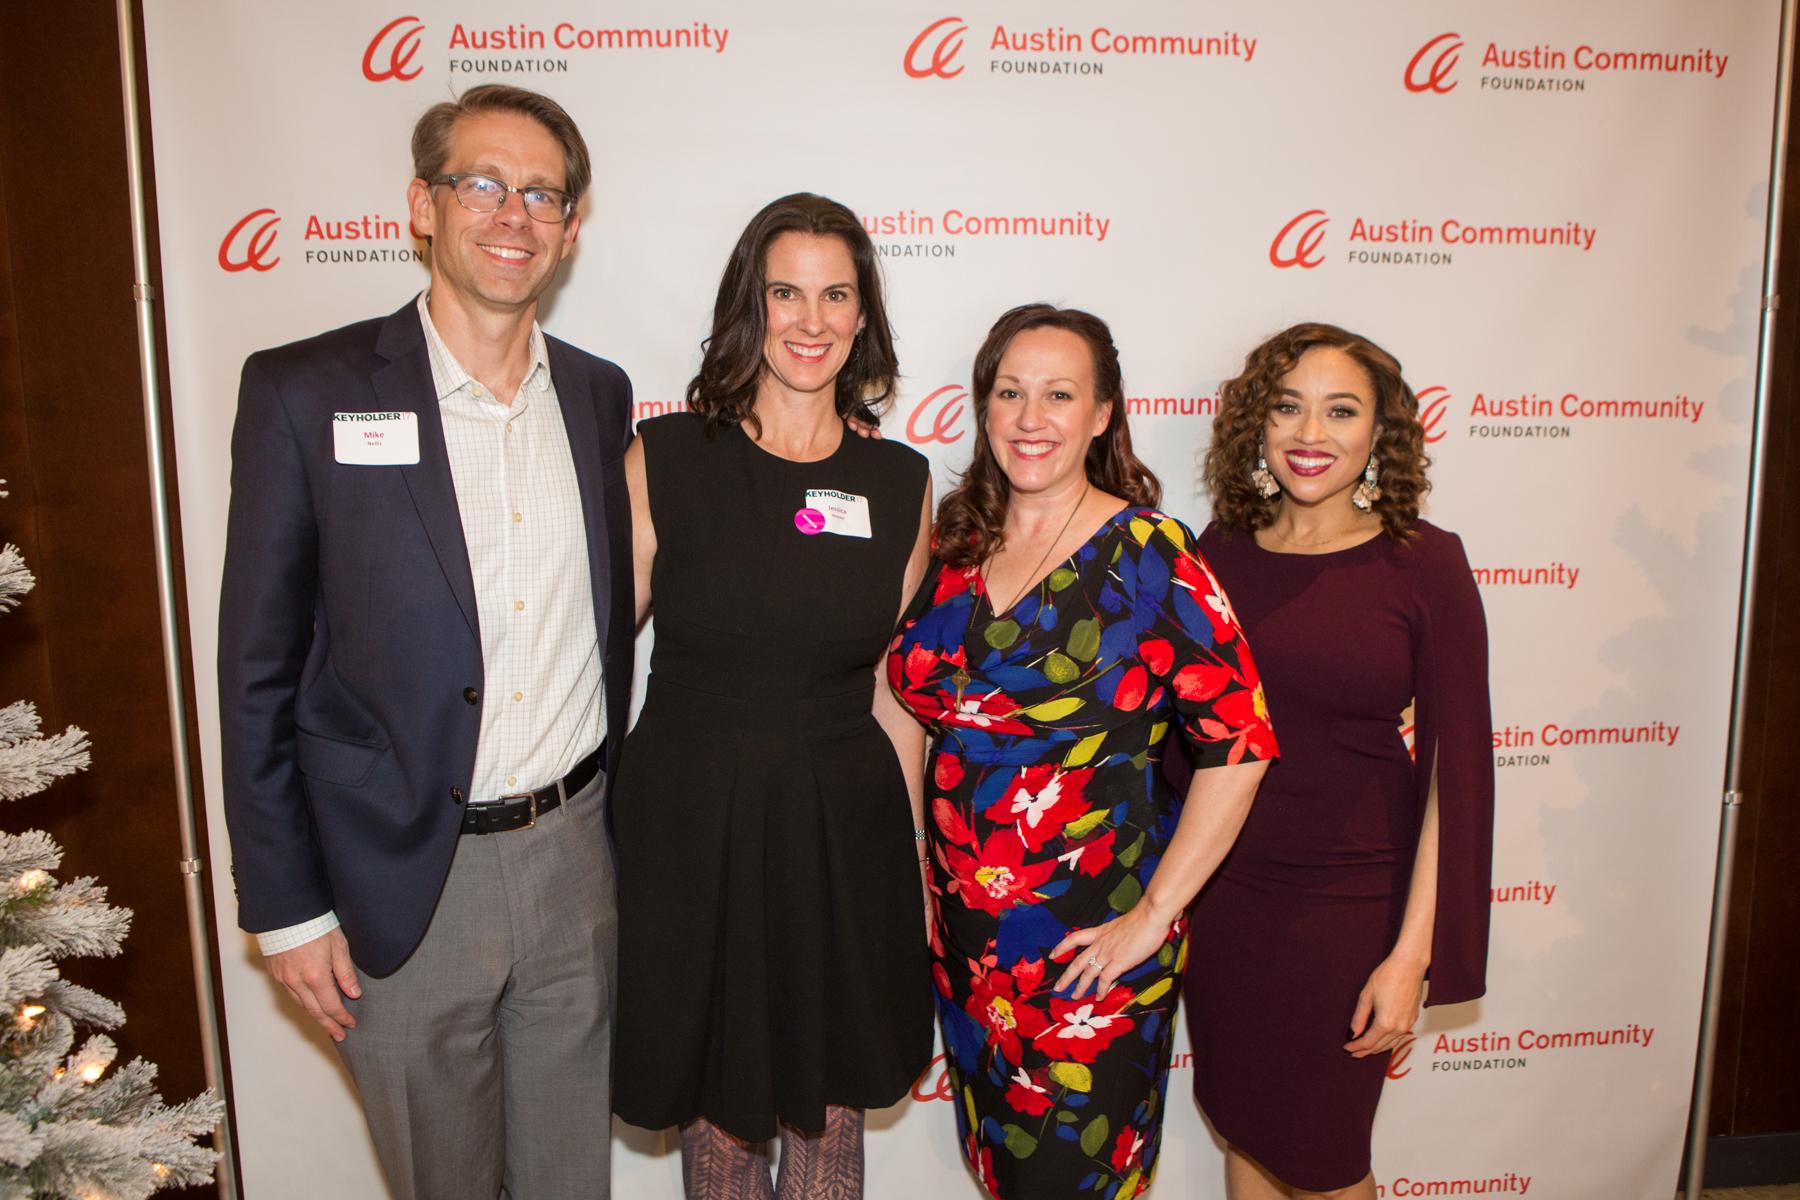 Image from Keyholder17. Left to right: Mike Nellis,Jessica Weaver, MJ Hegar, Terri Broussard Williams